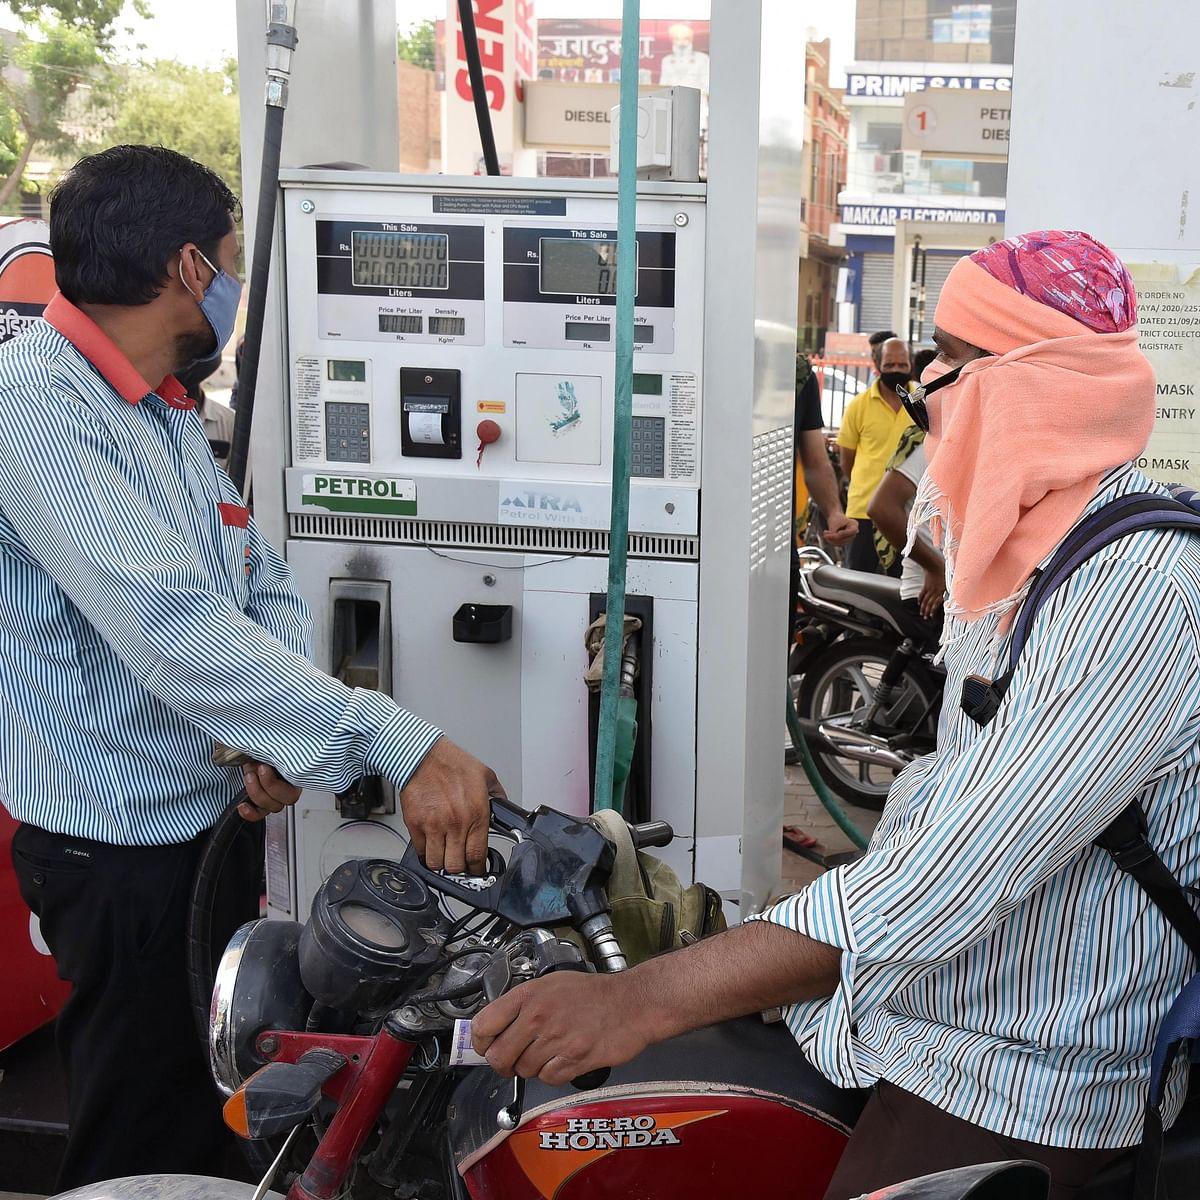 Petrol, diesel prices remain unchanged: Check fuel prices in Mumbai, Delhi, Kolkata and Chennai